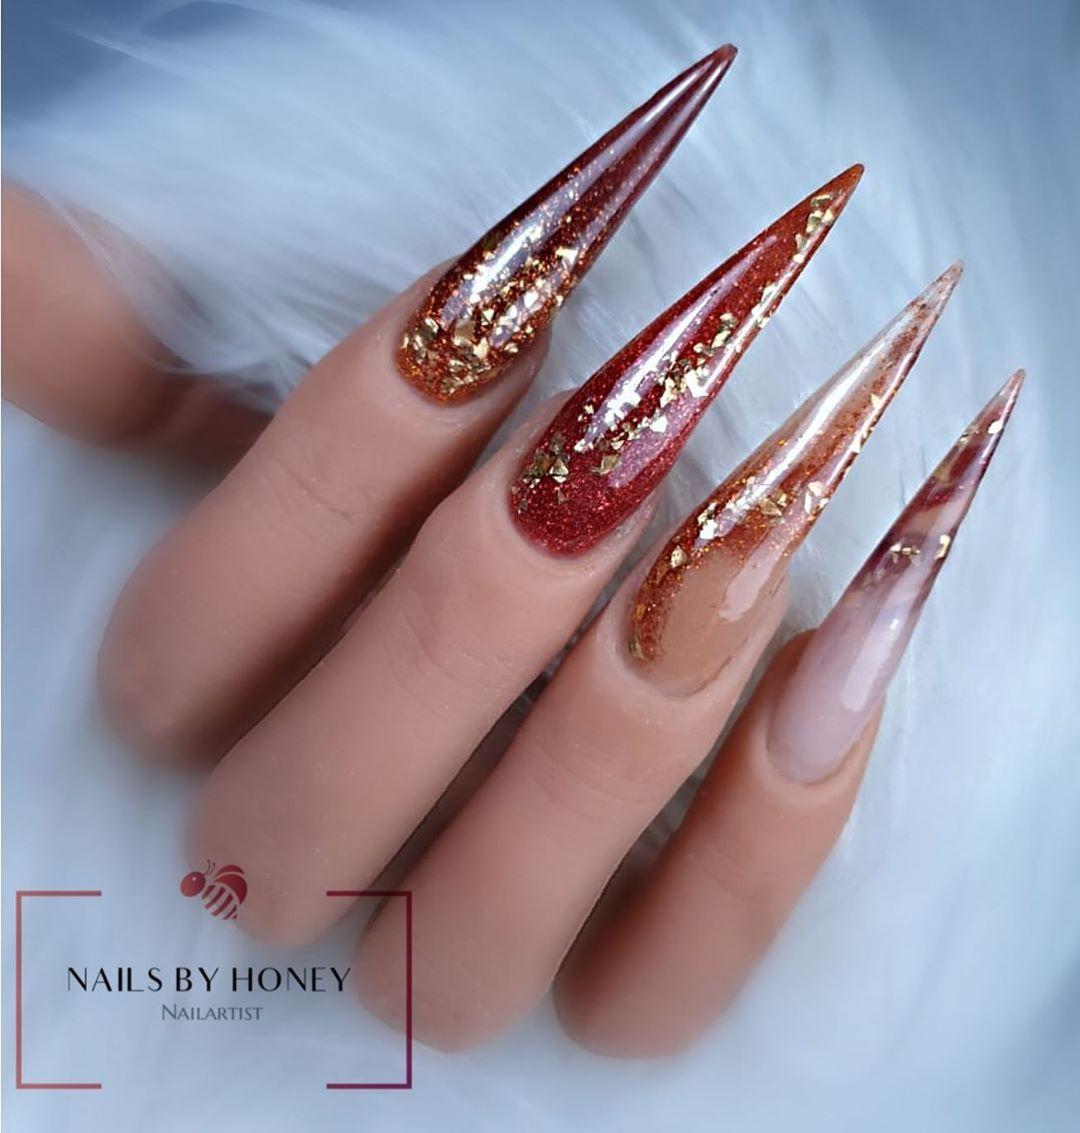 Products Used Basics Glitterbels Dehydrator Glitterbels Primer Glitterbels In 2020 Cardi B Nails Pink Nail Art Swag Nails